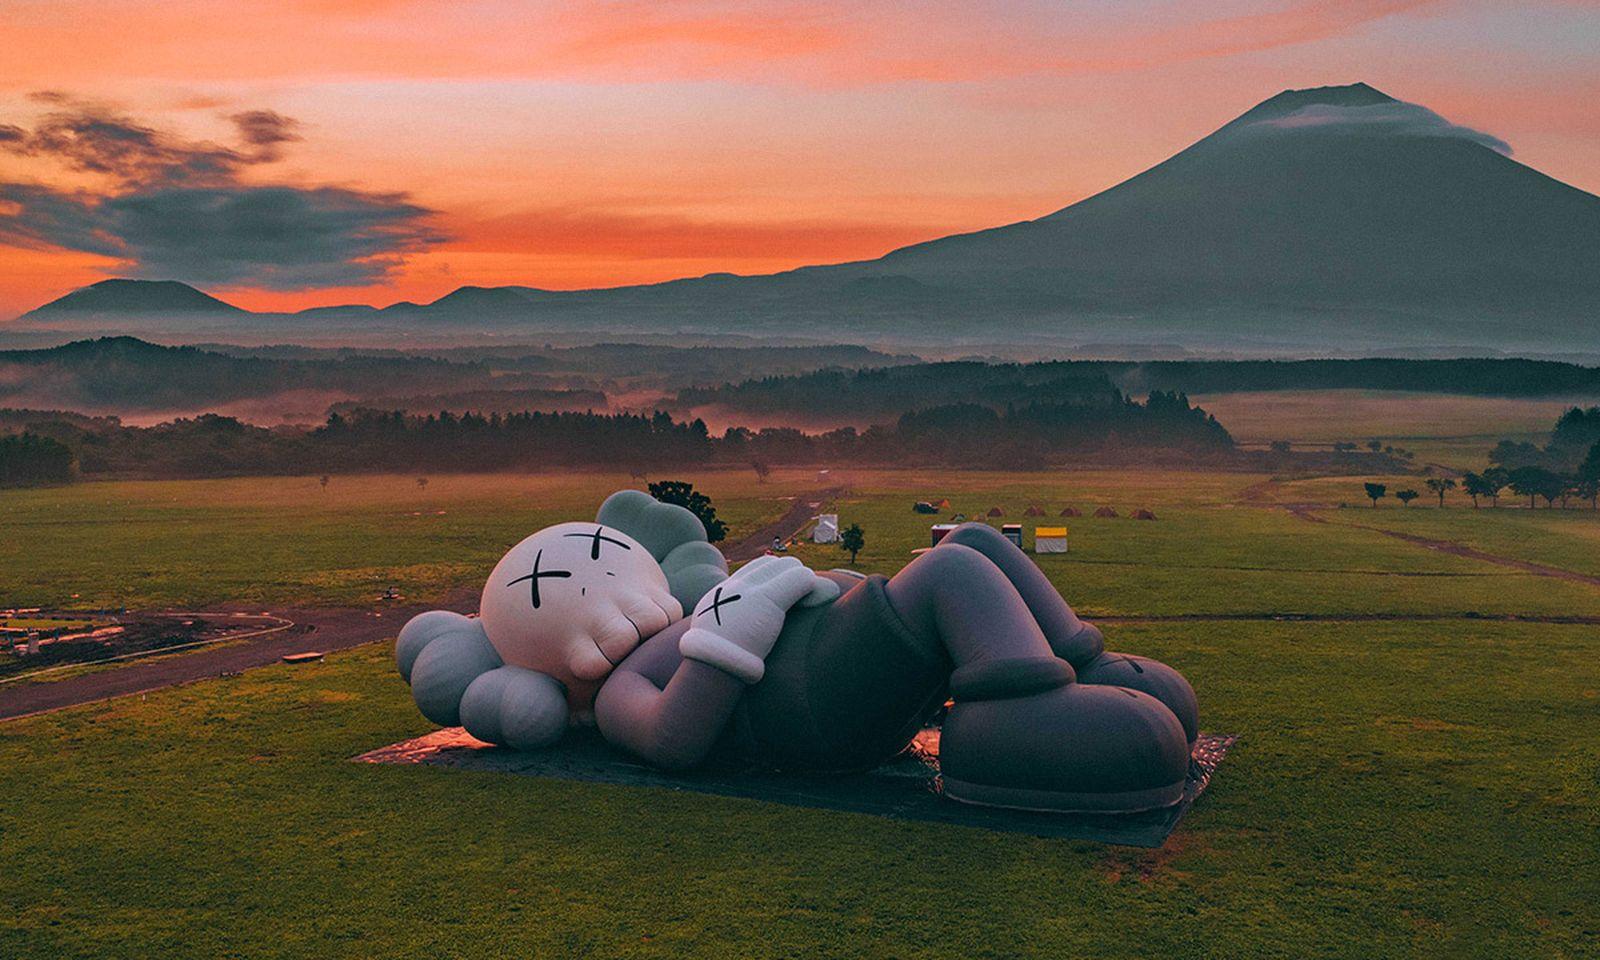 kaws holiday fuji feature Hershel Supply